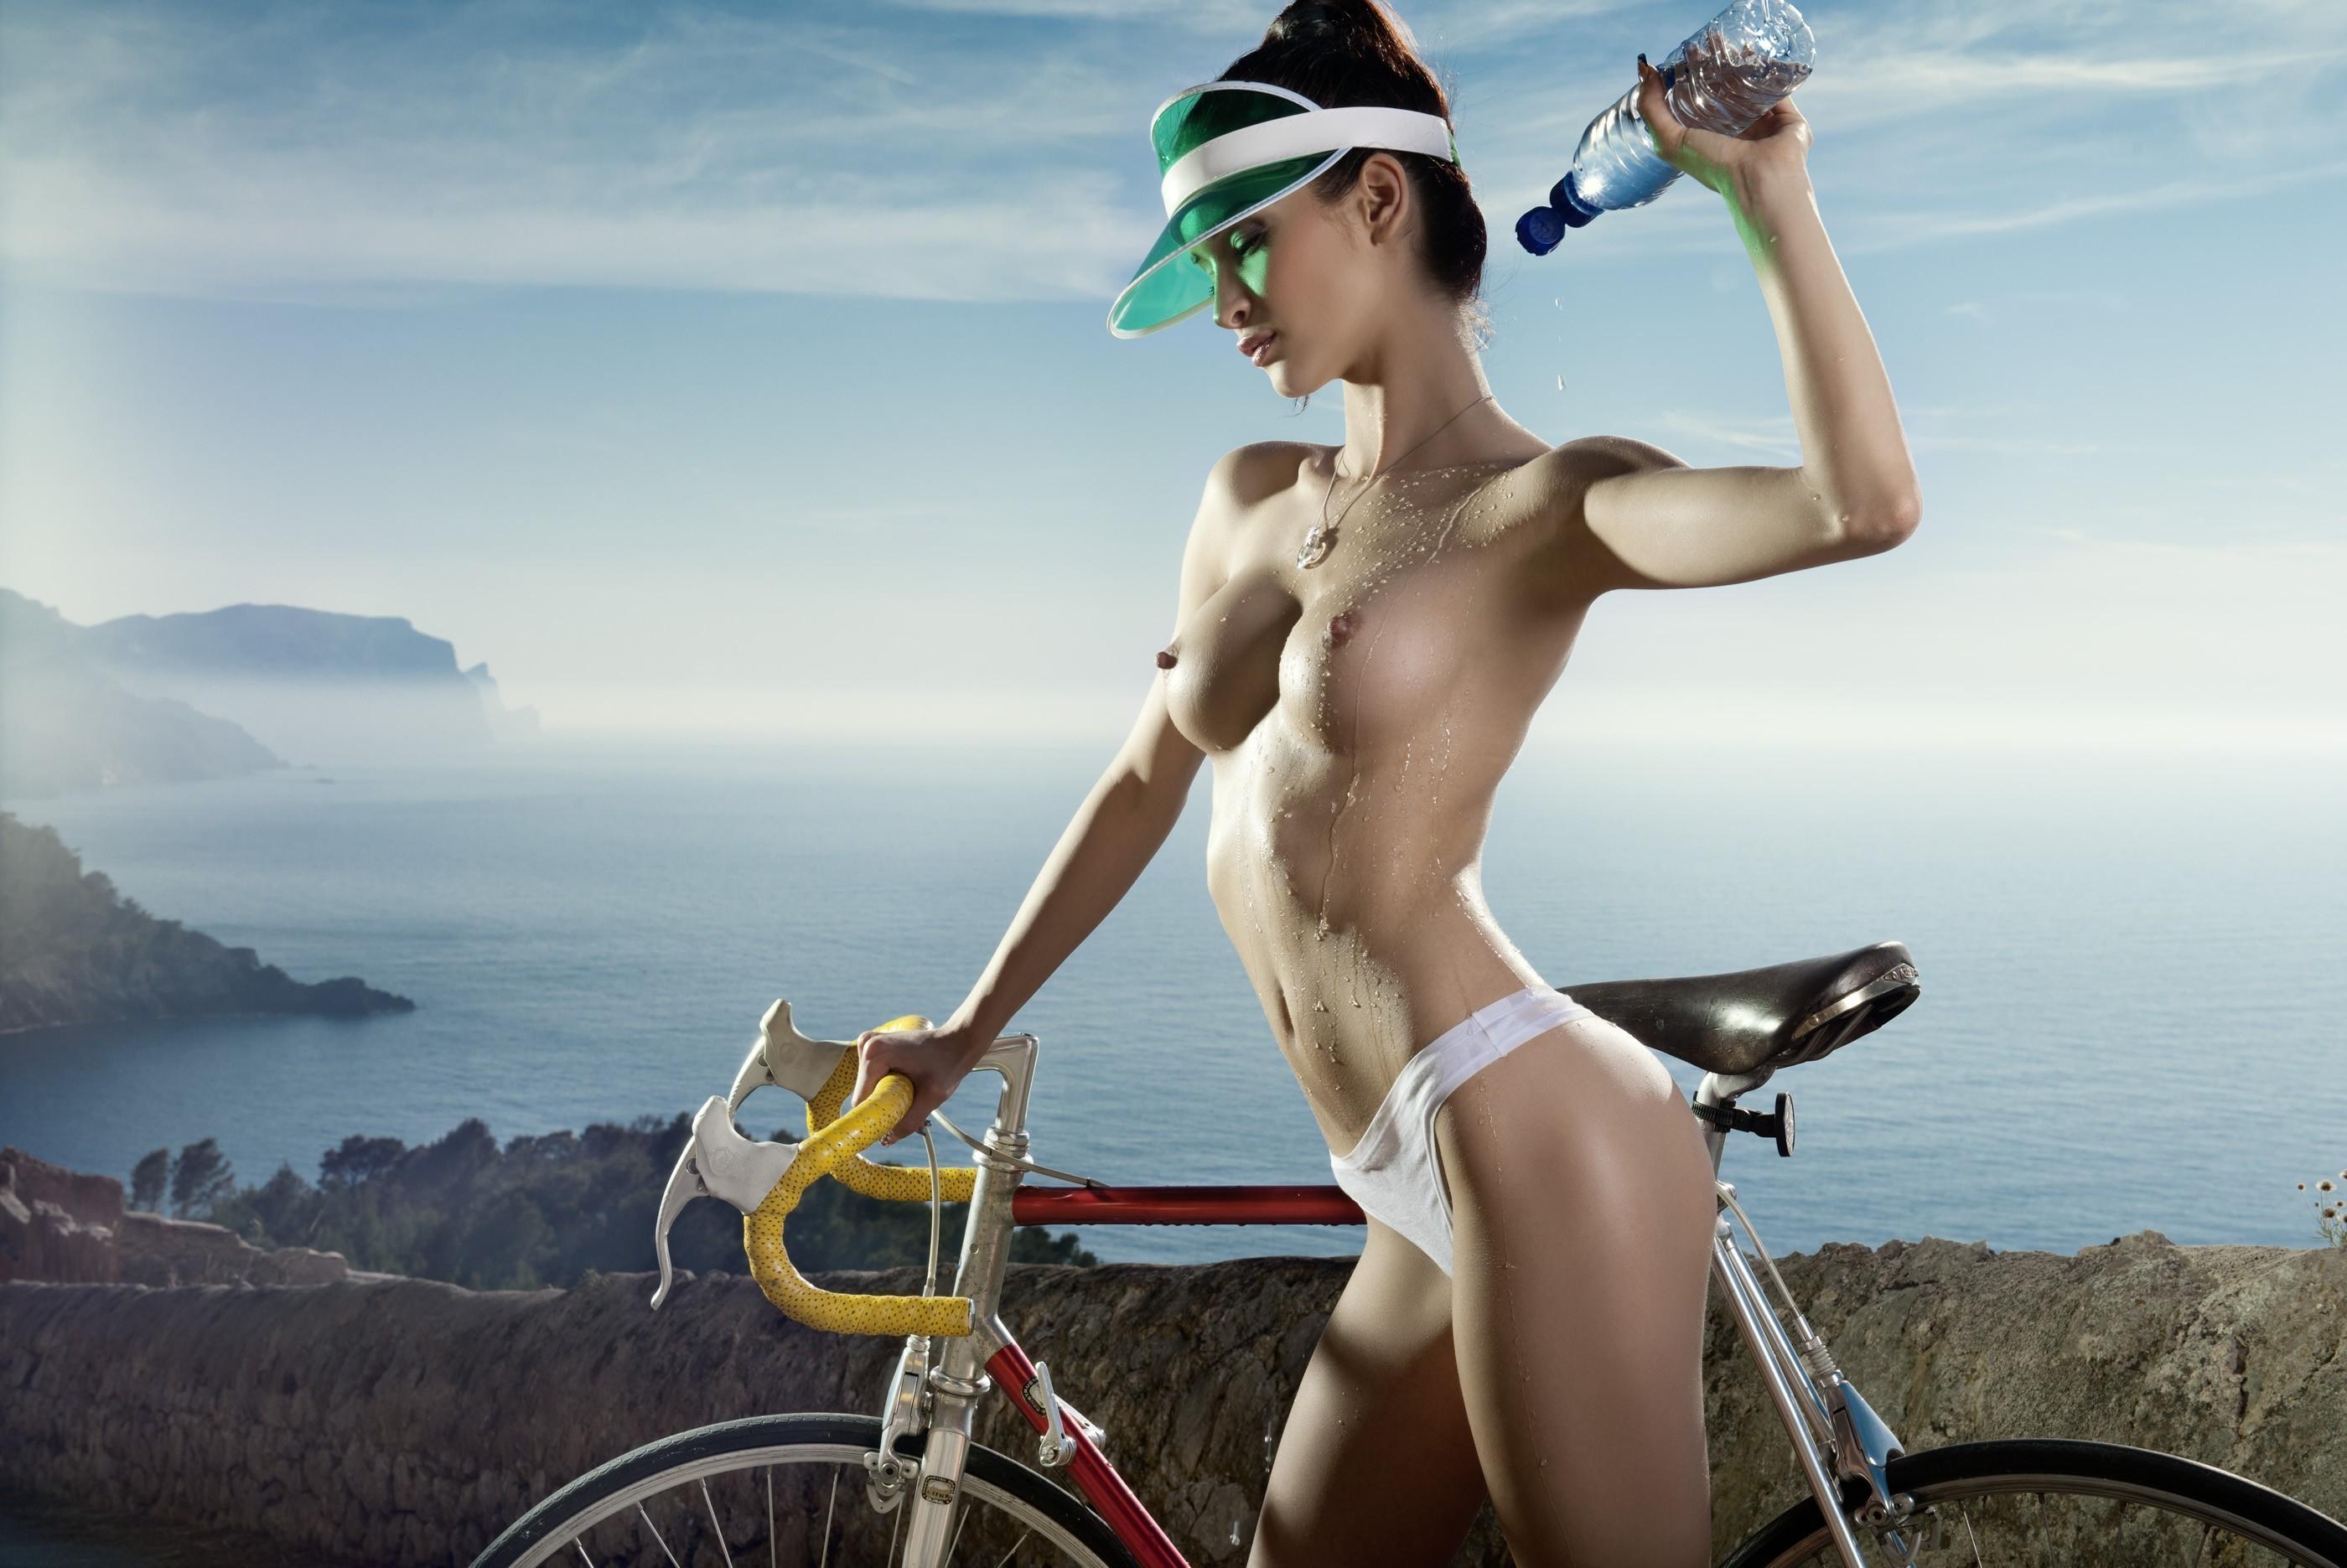 Эротика девушки на велосипеде 8 фотография